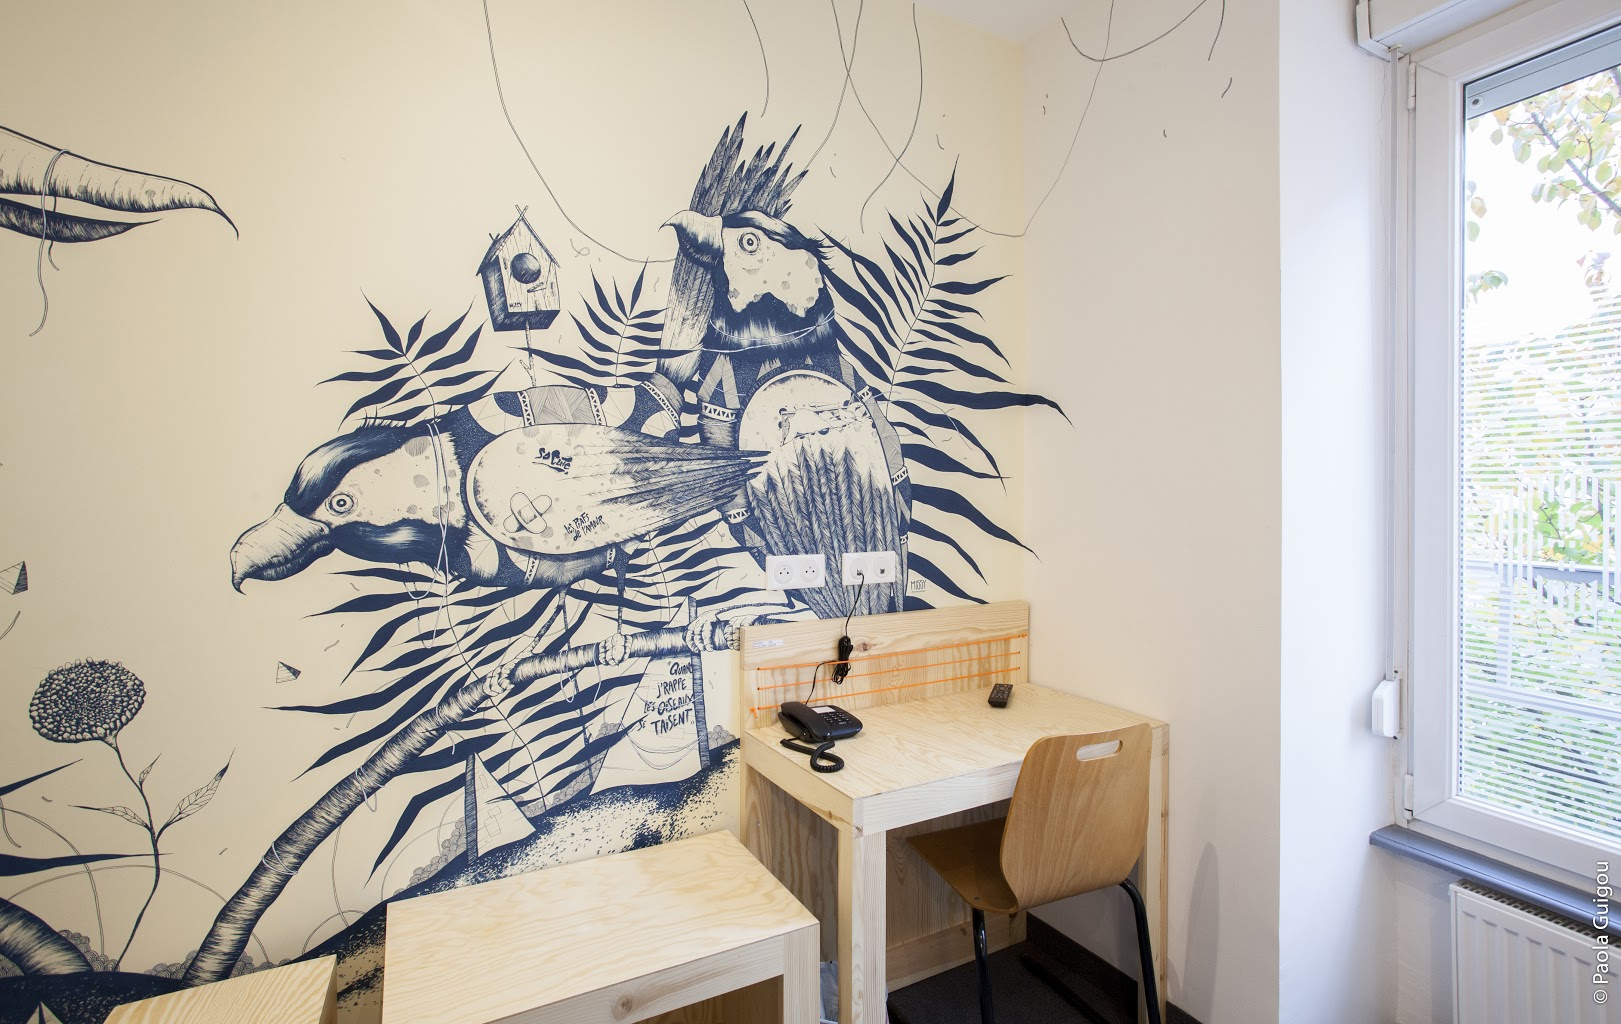 Room 108 by MISSY - (c) Paola Guigou - Graffalgar - 310